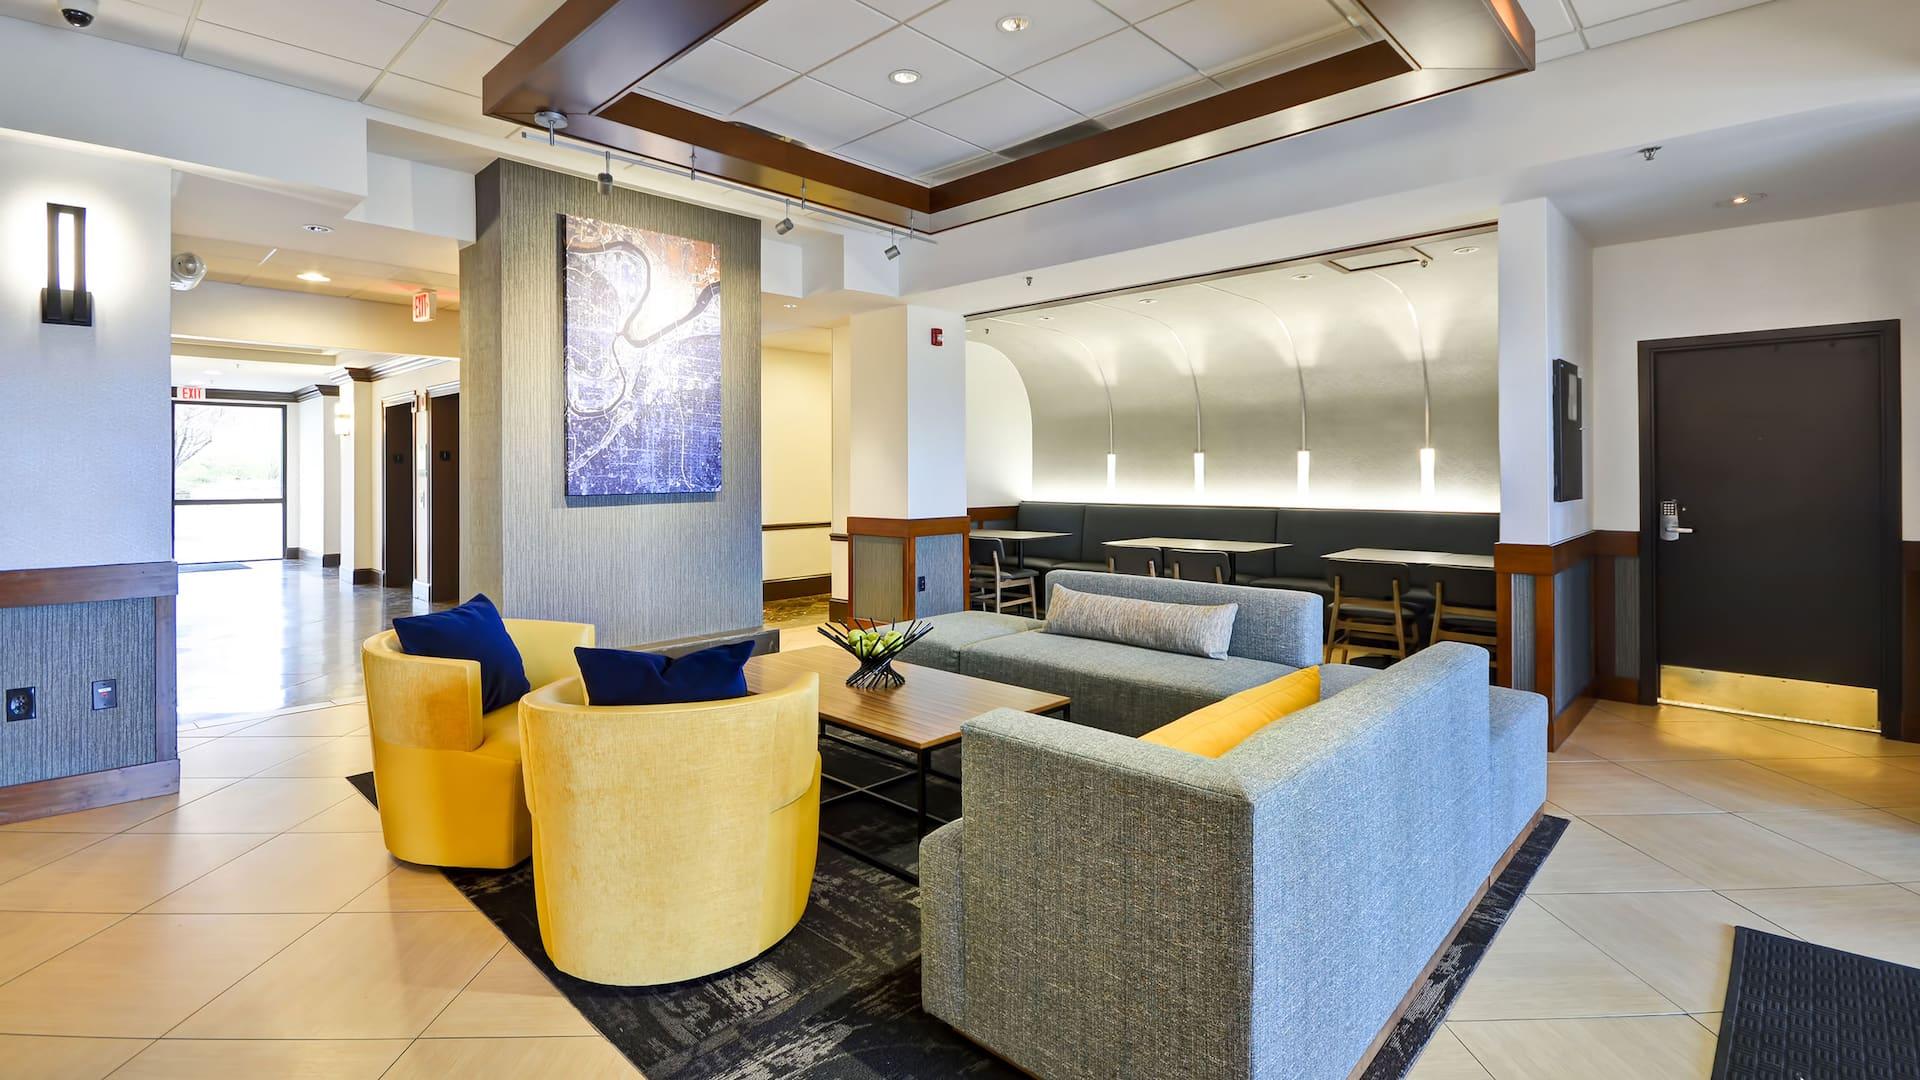 Hyatt Place Kansas City / Overland Park / Metcalf Hotel Lobby Seating & Waiting Area